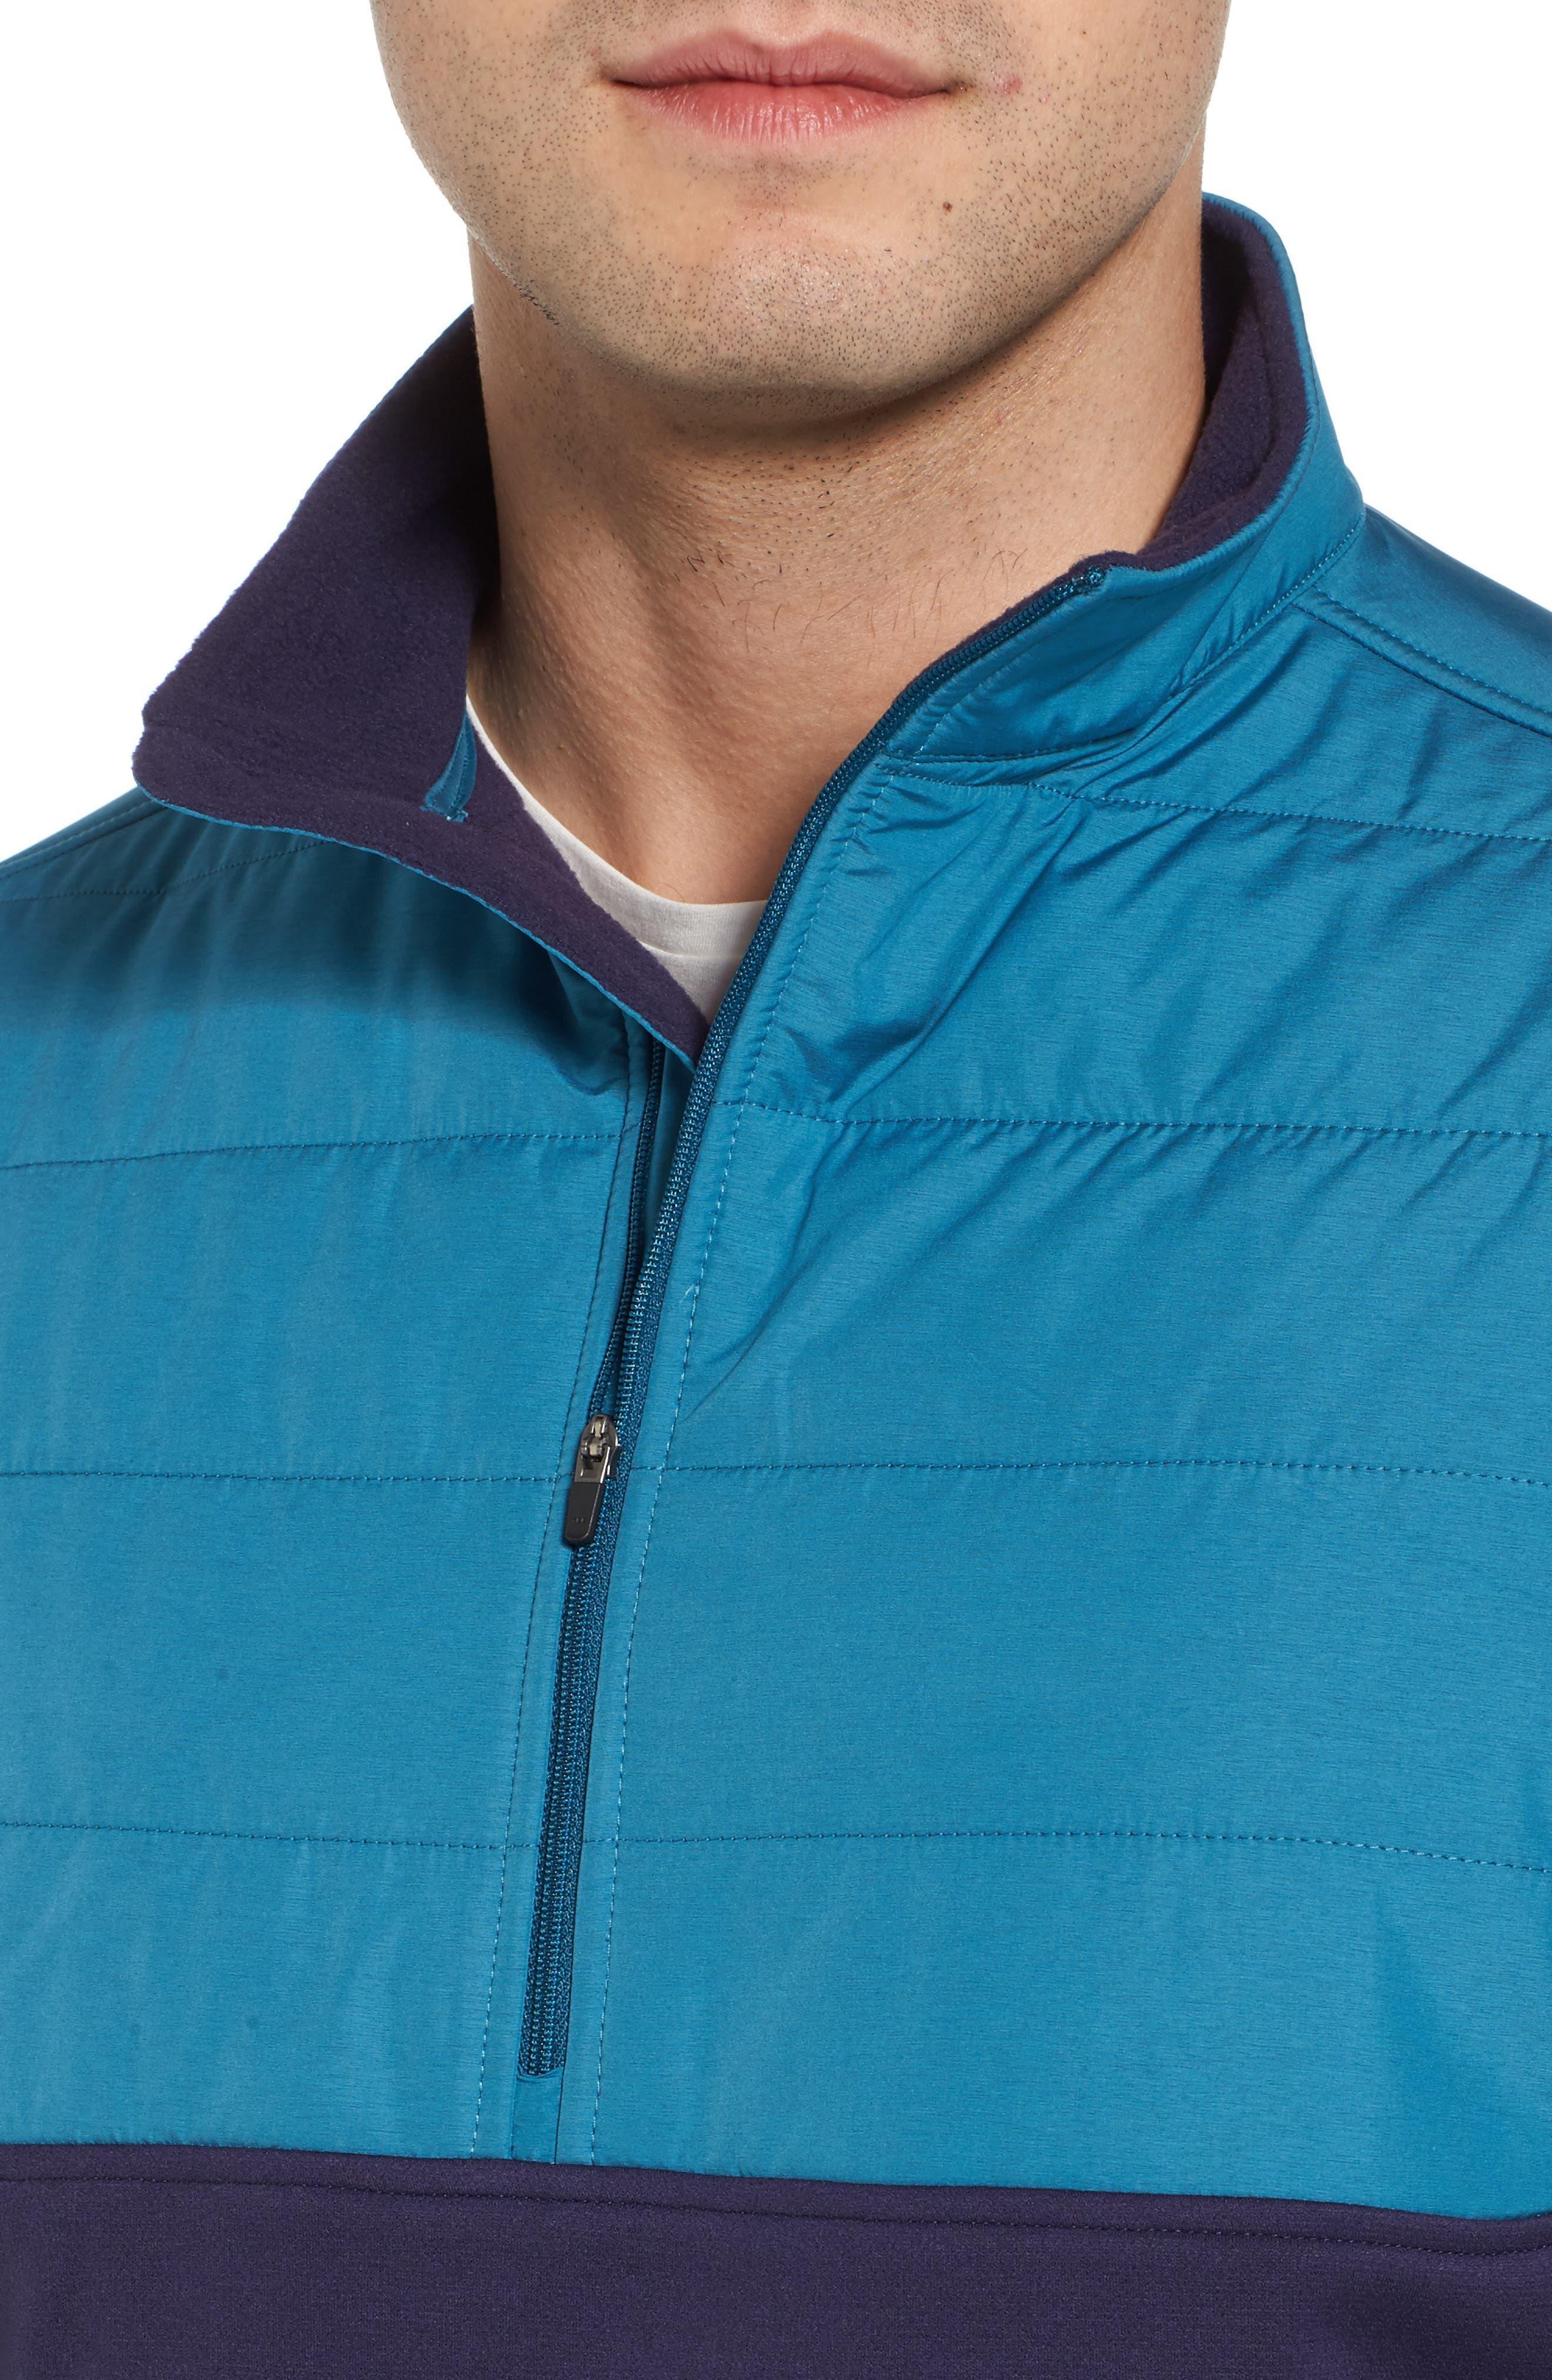 Sheffield Hybrid Half Zip Pullover,                             Alternate thumbnail 4, color,                             Yankee Blue